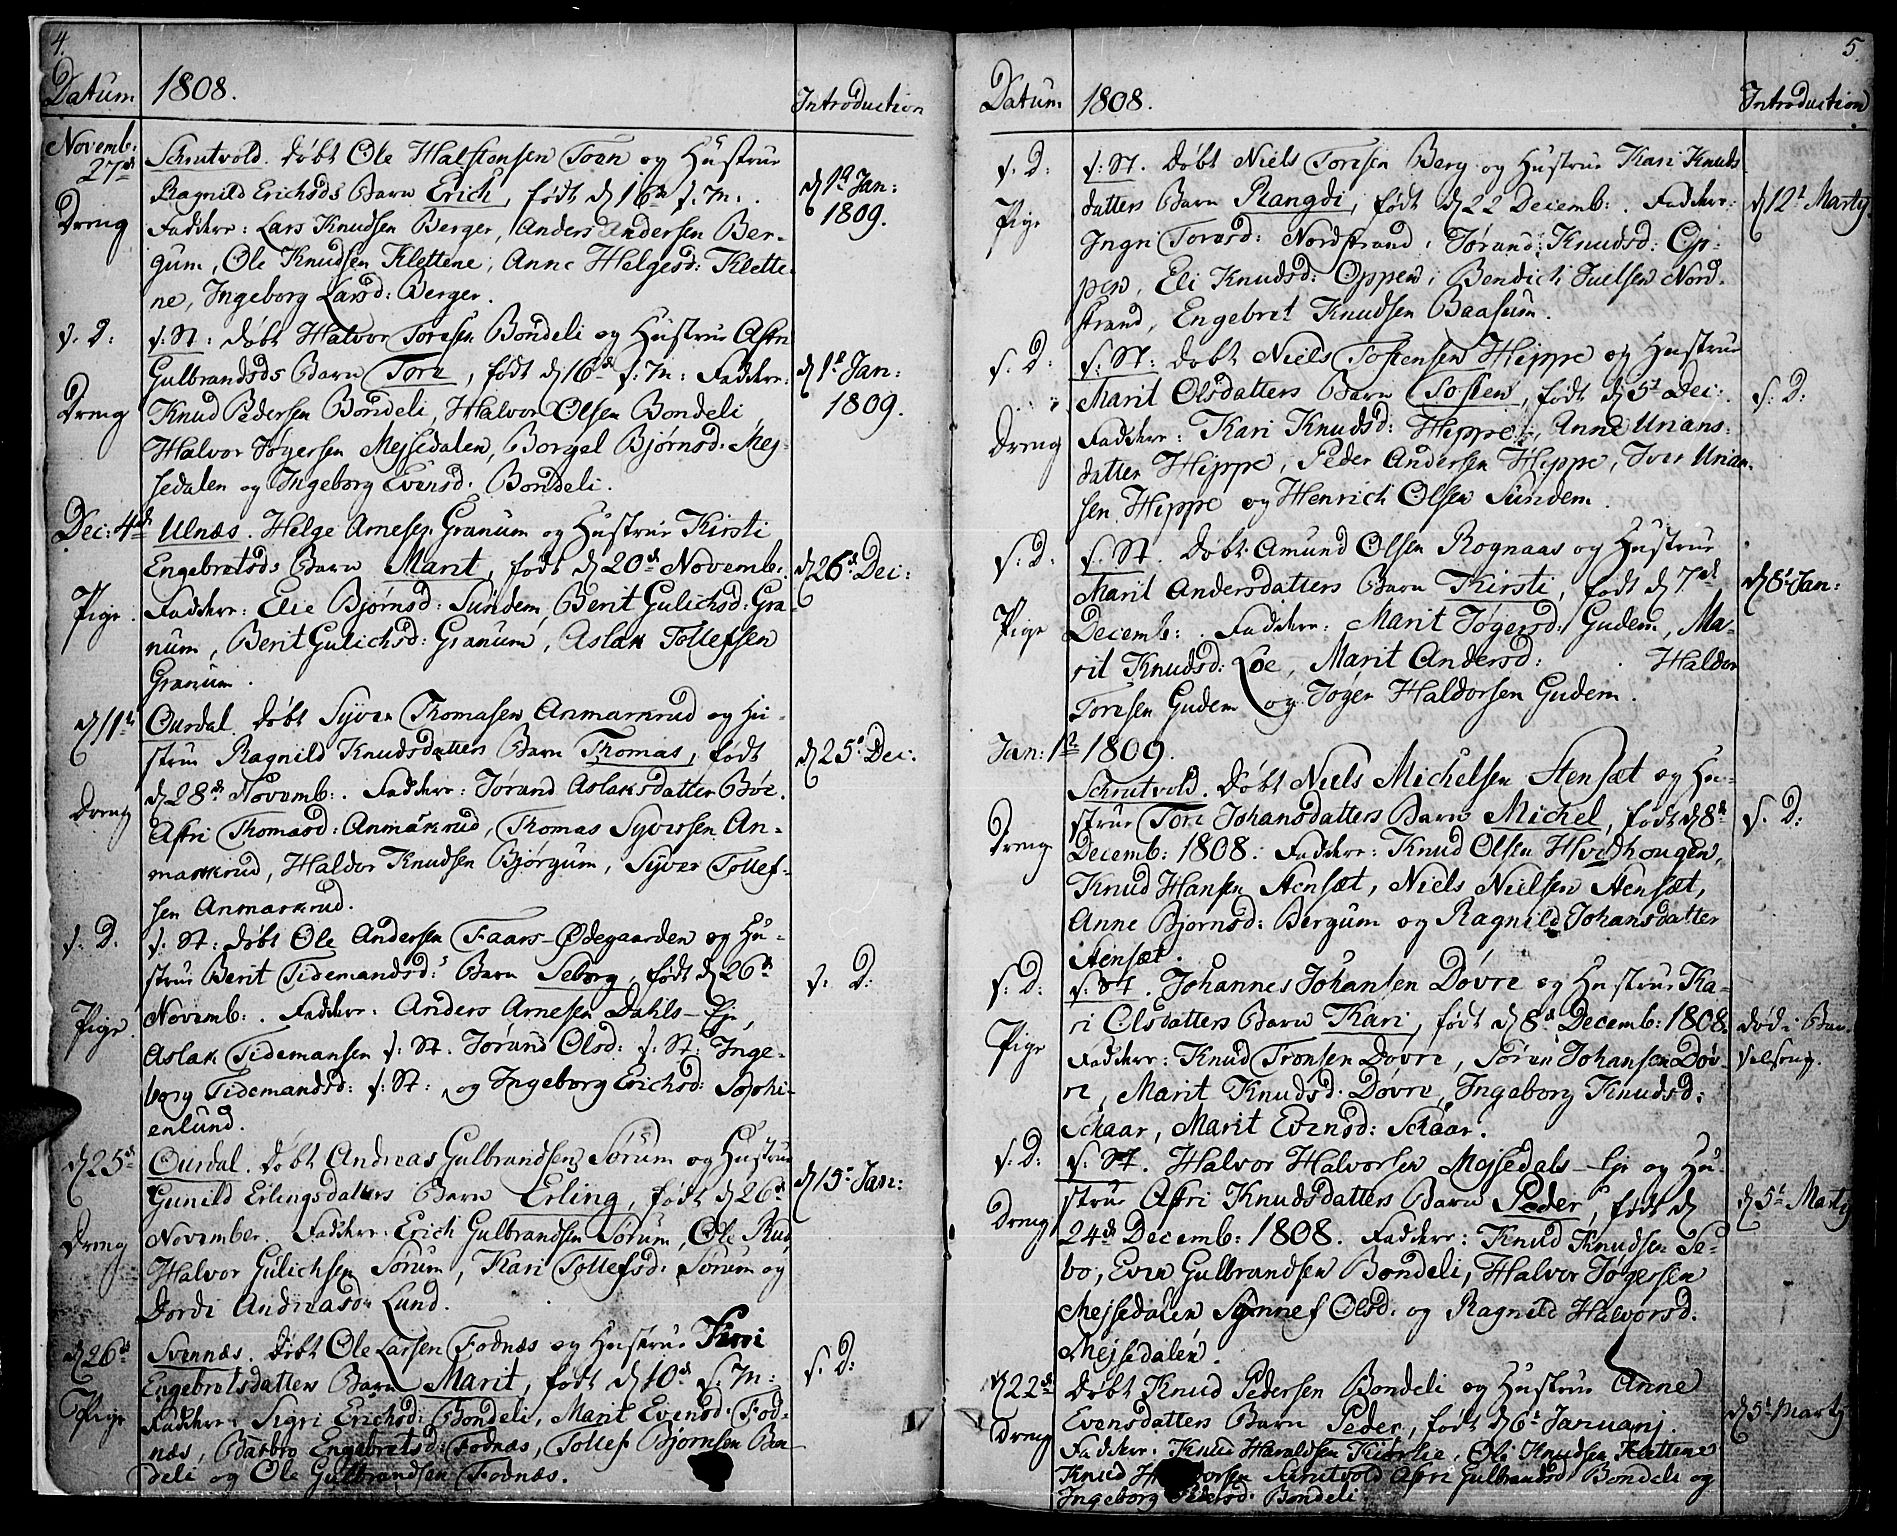 SAH, Nord-Aurdal prestekontor, Ministerialbok nr. 1, 1808-1815, s. 4-5